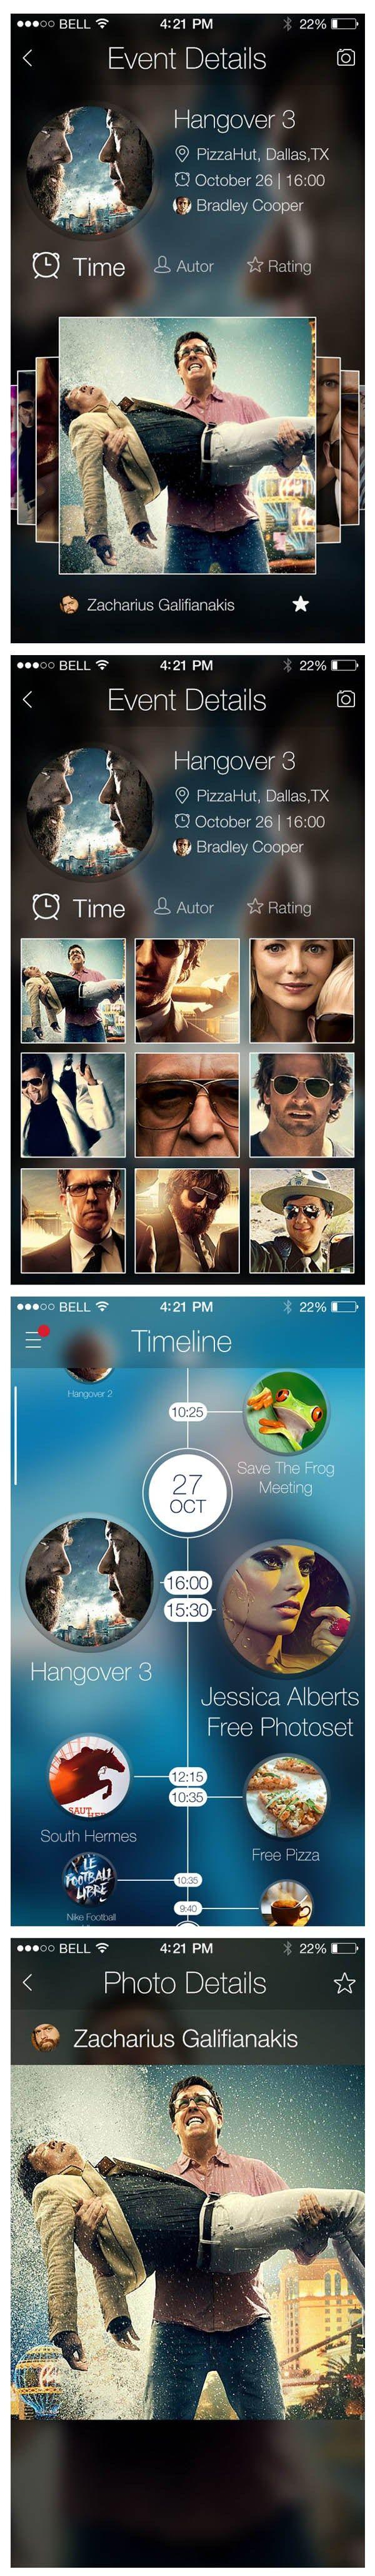 iOS7 Photo+Event App